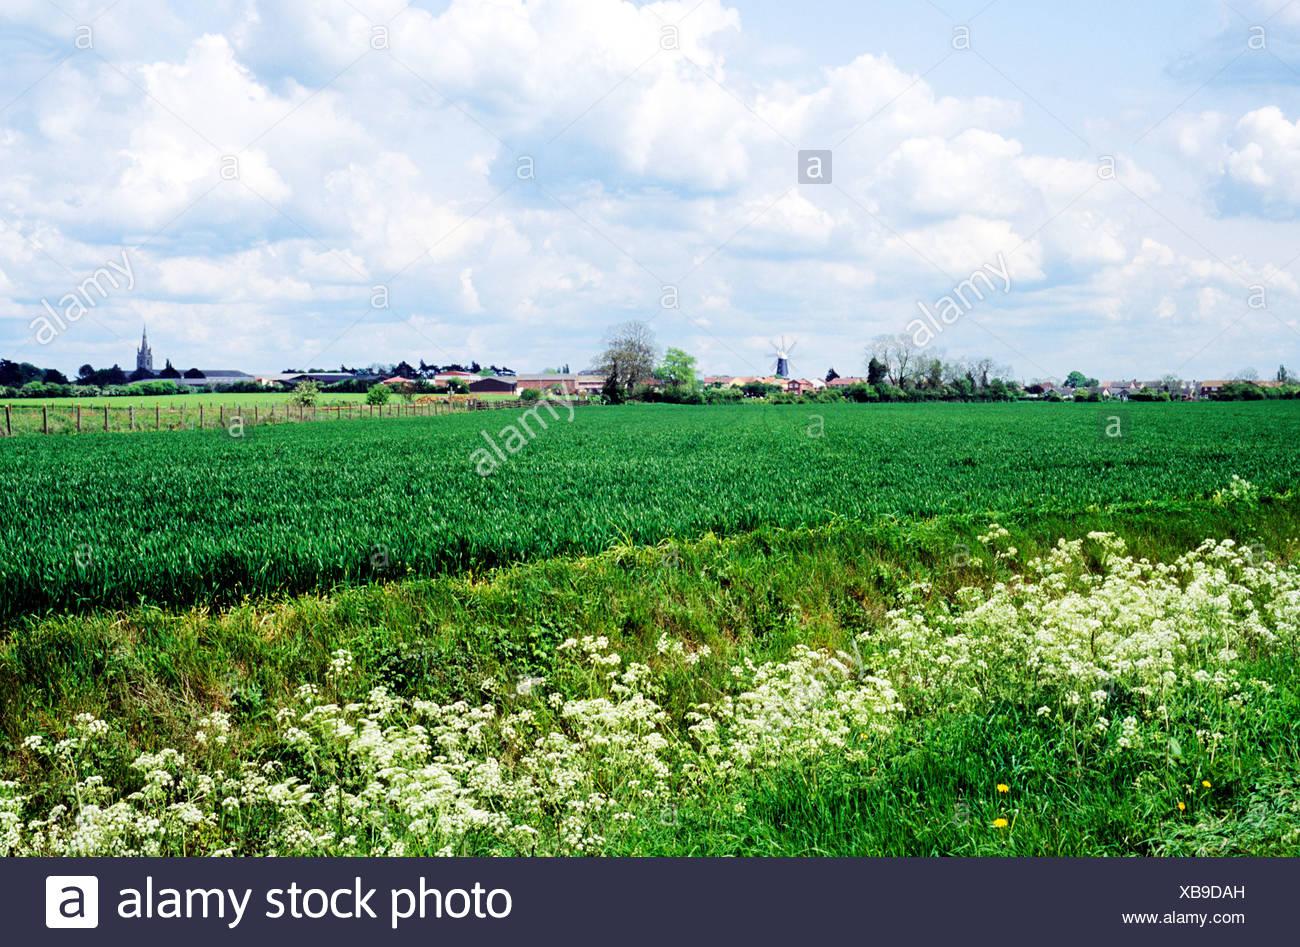 images of lincolnshire farming memories nostalgia